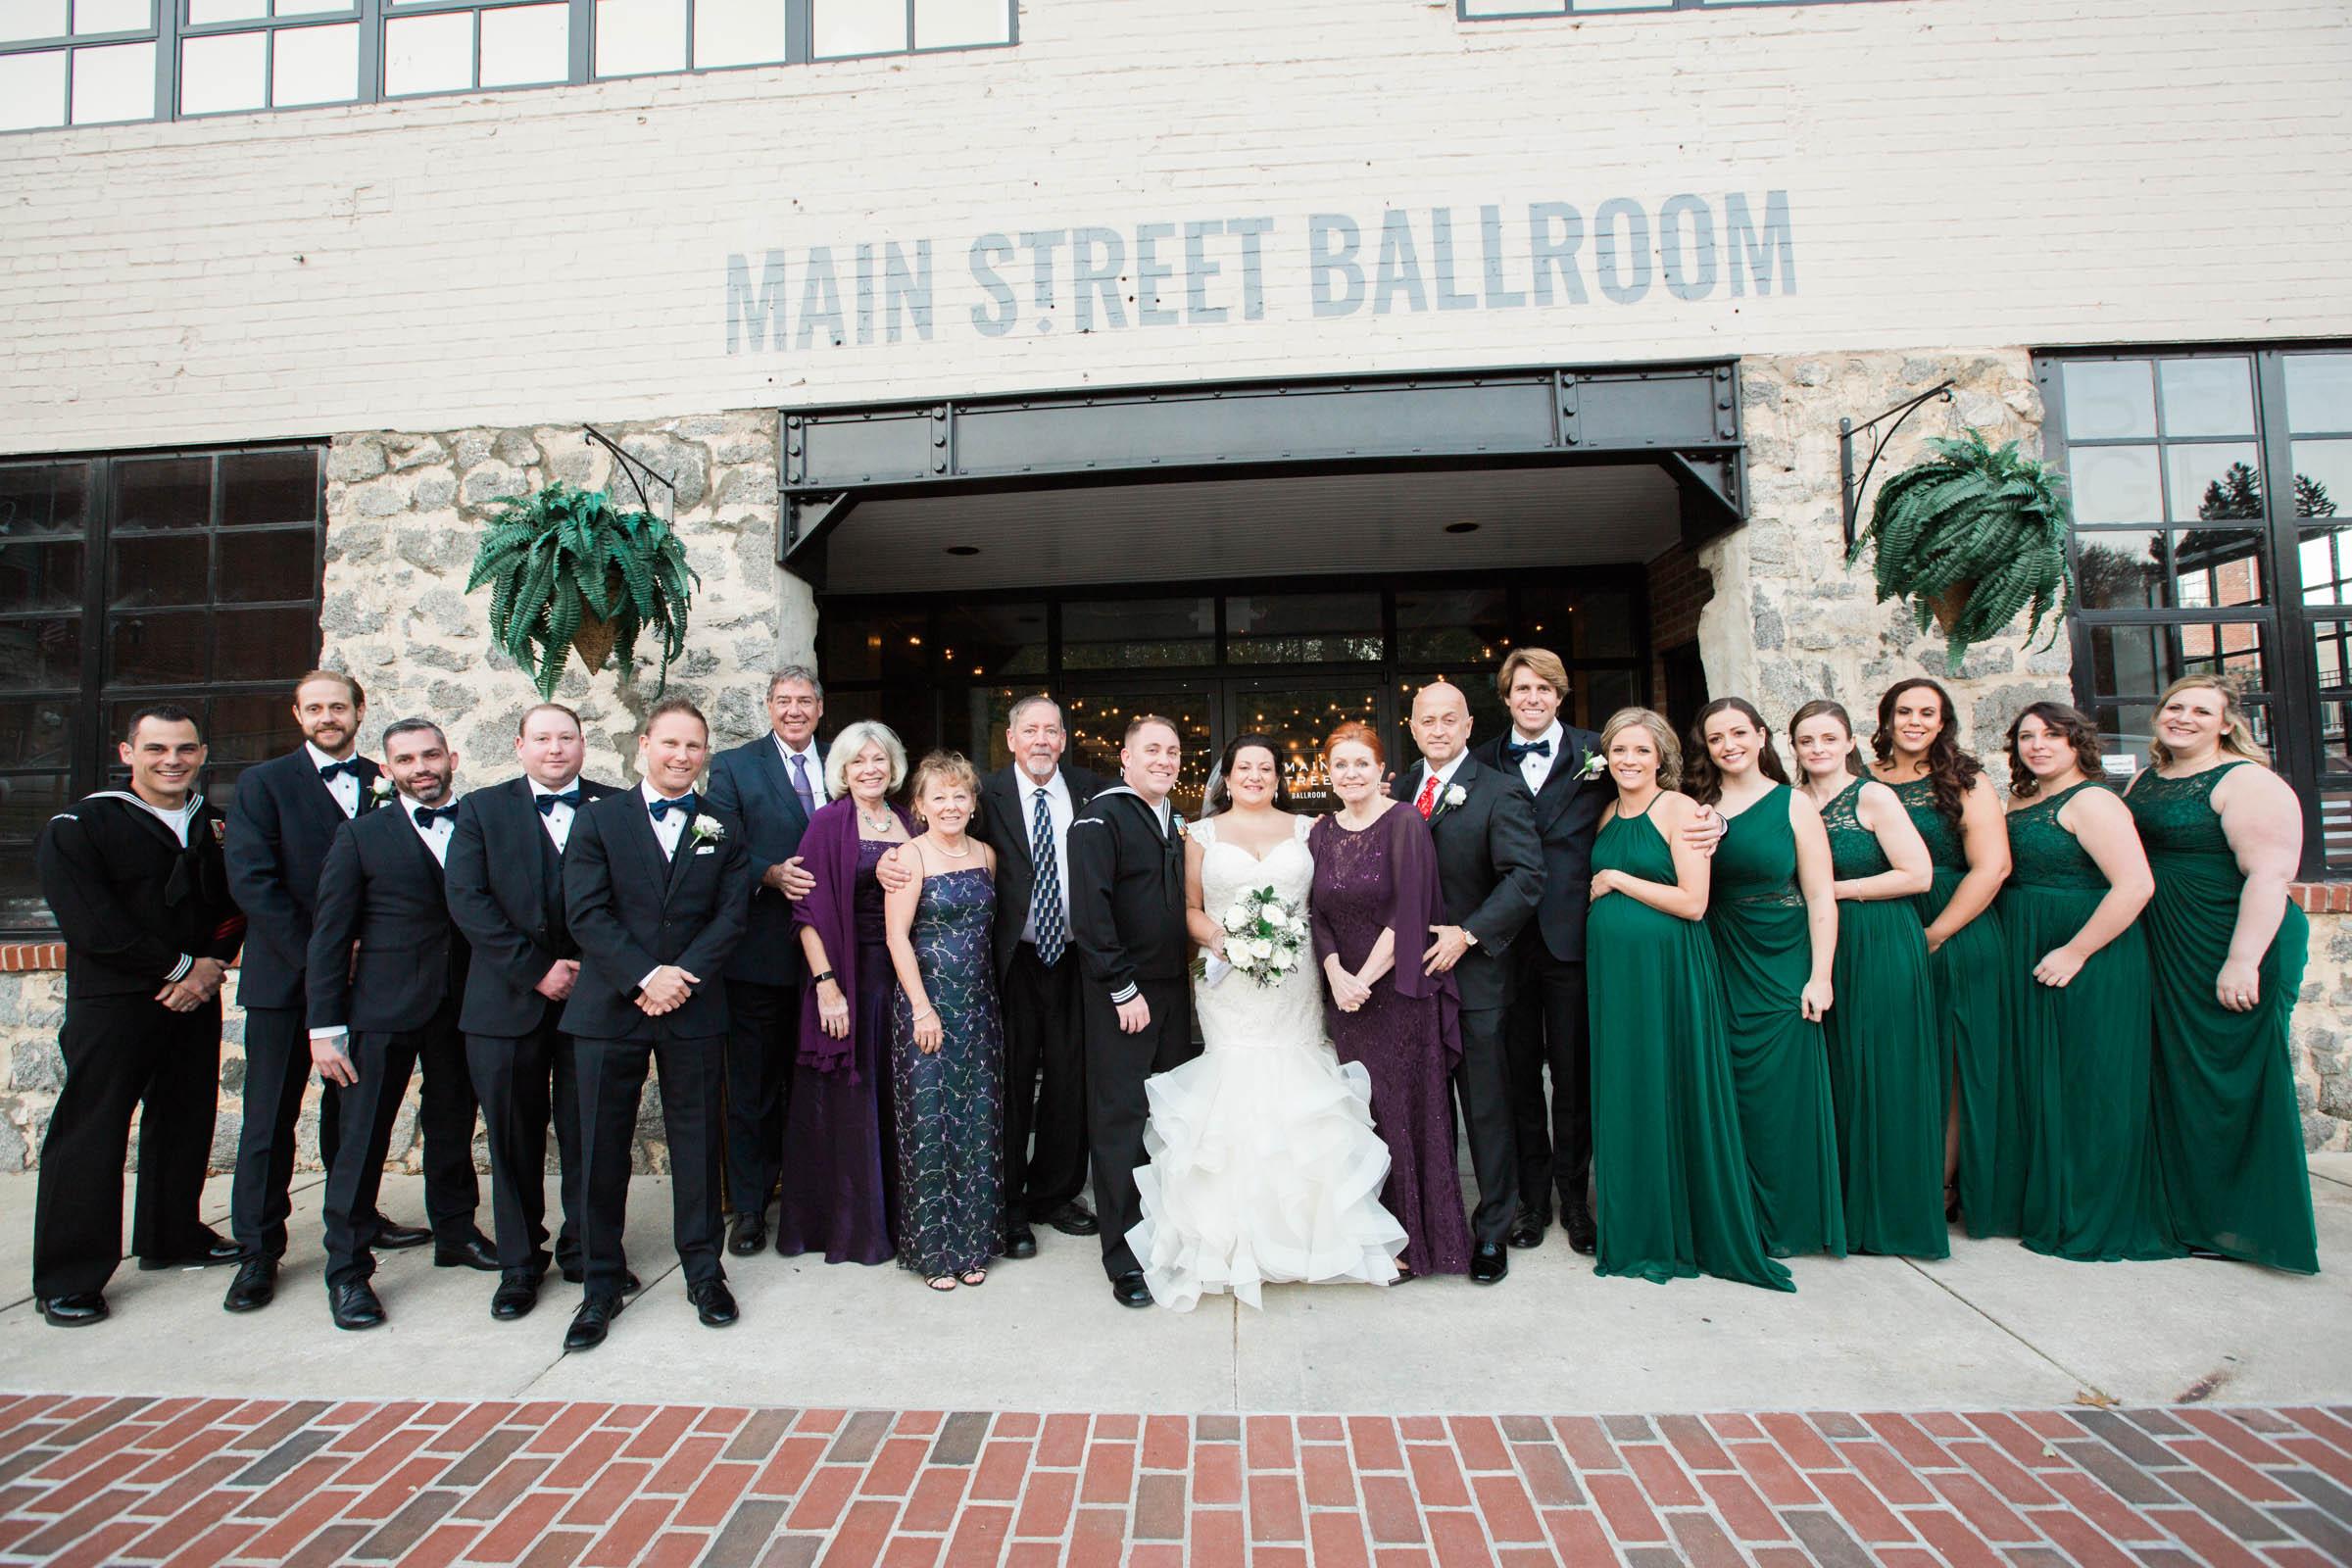 Main Street Ballroom Ellicott City Wedding Curvy Bride Baltimore Maryland Wedding Photographers (48 of 111).jpg